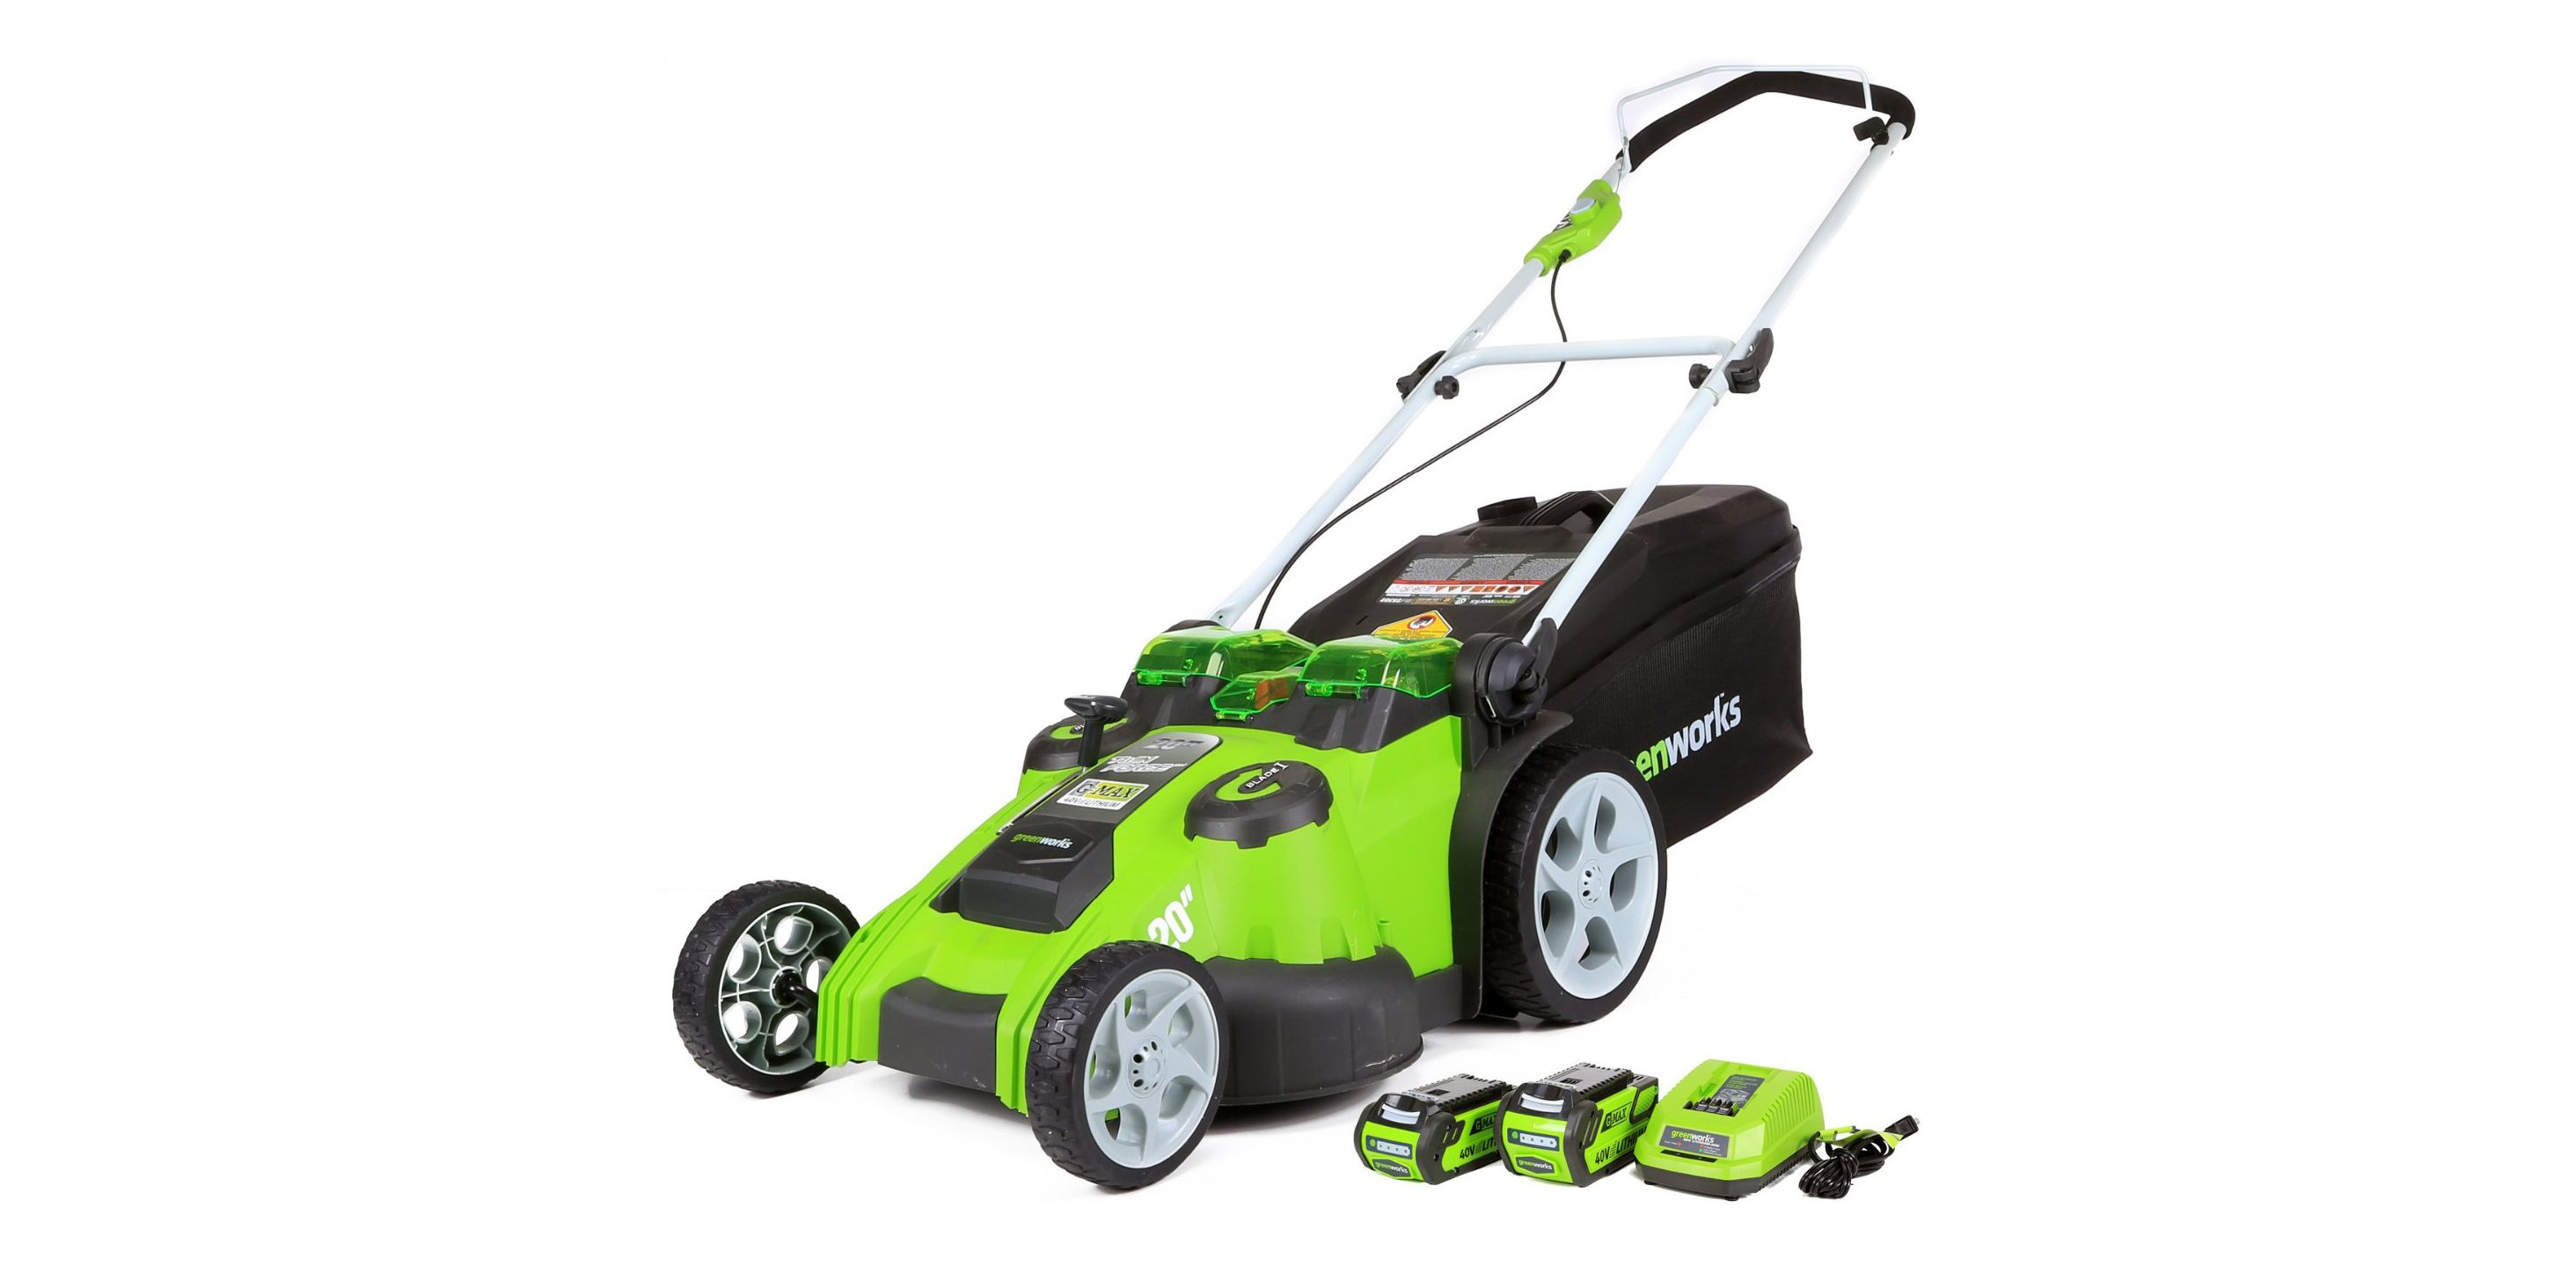 greenworks-gmax-40-lawn-mower1